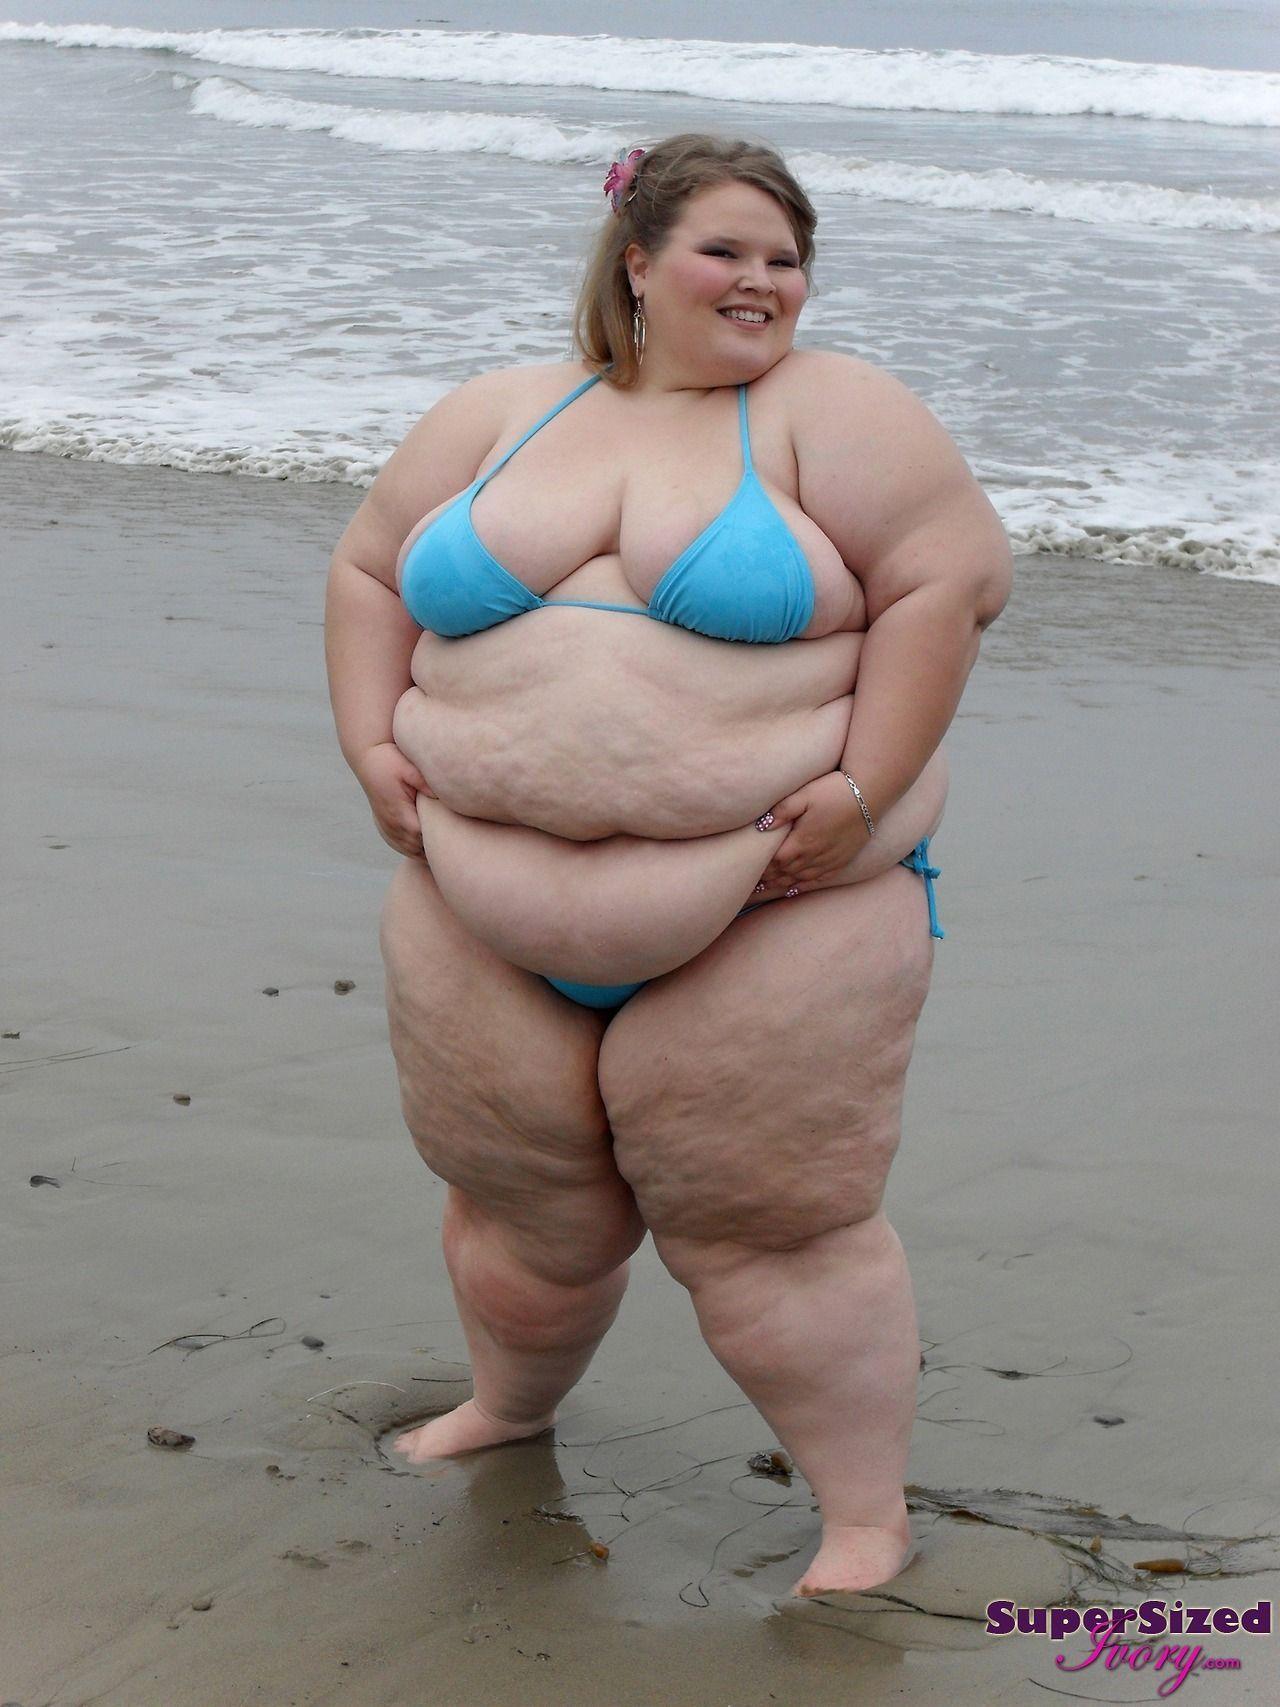 Slut girl pictures